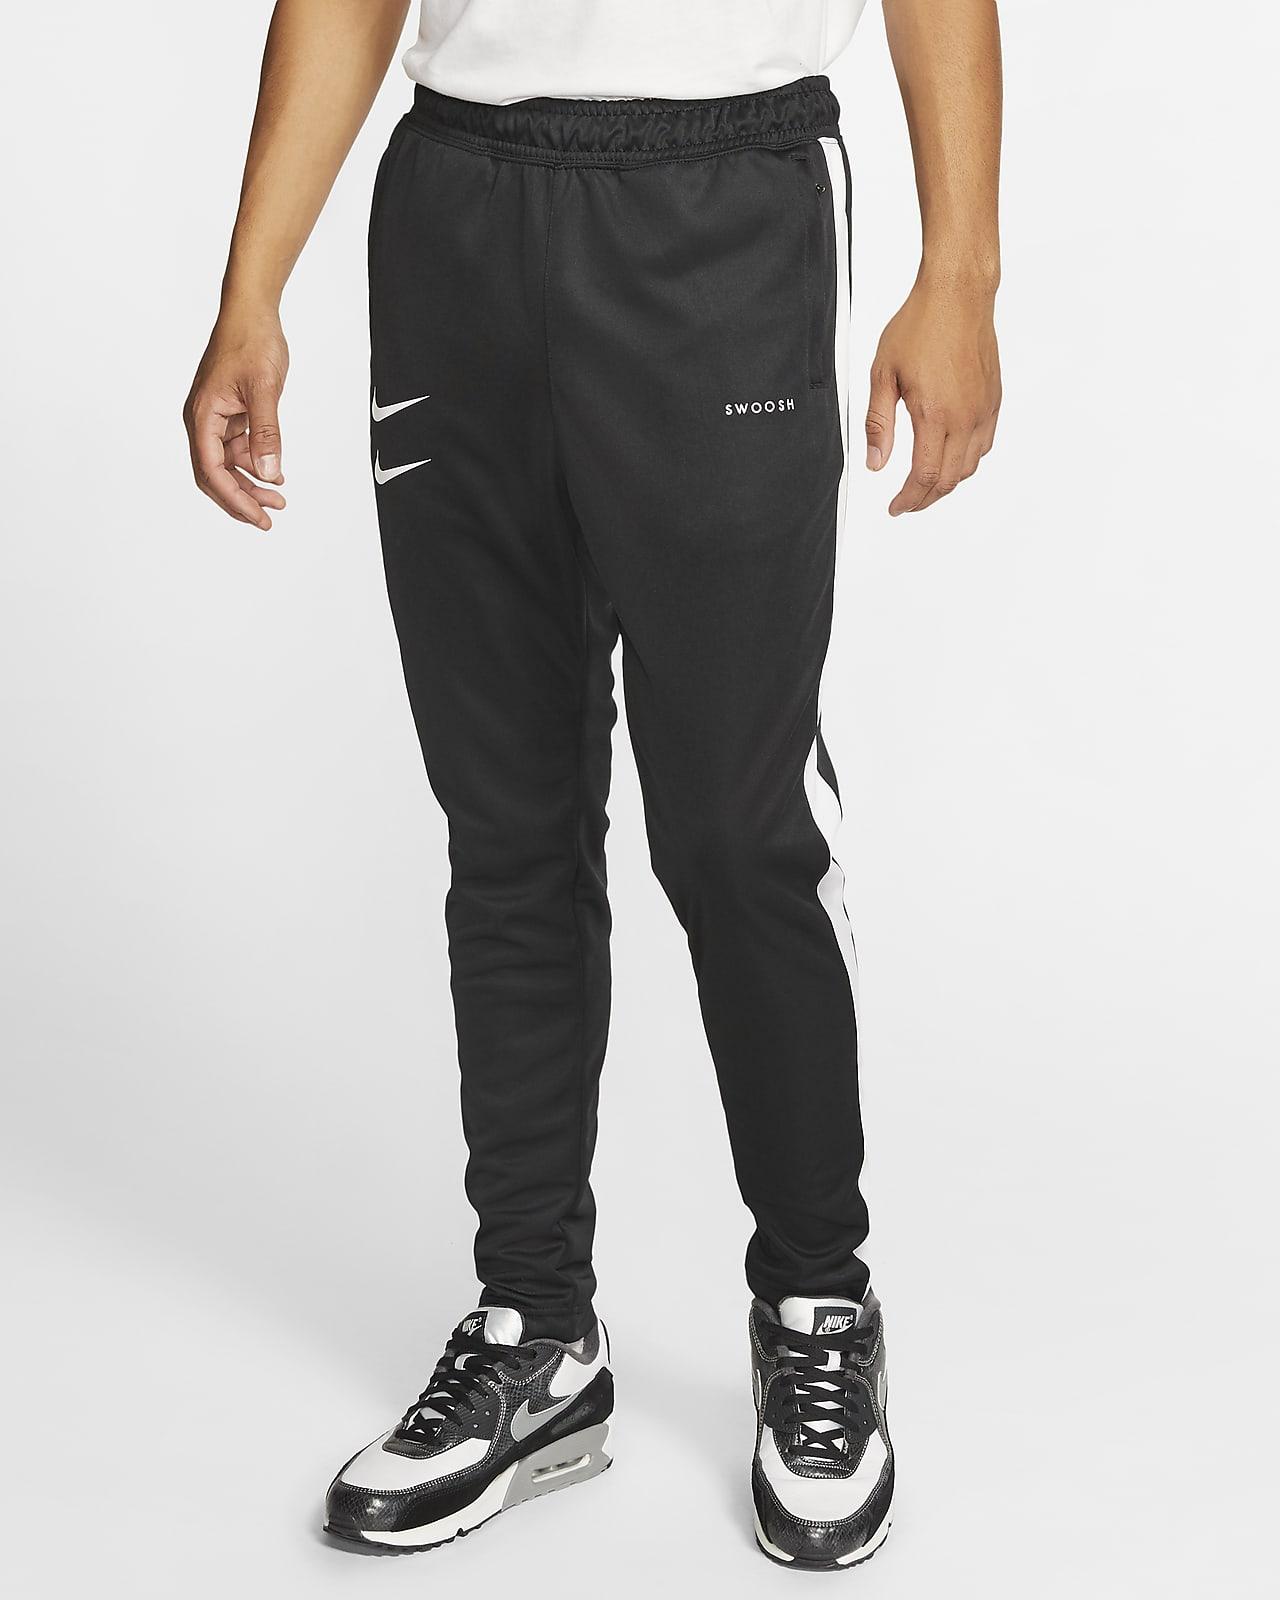 عضوي شخص غريب بطانة Pantalon Nike Sportswear Hombre Outofstepwineco Com